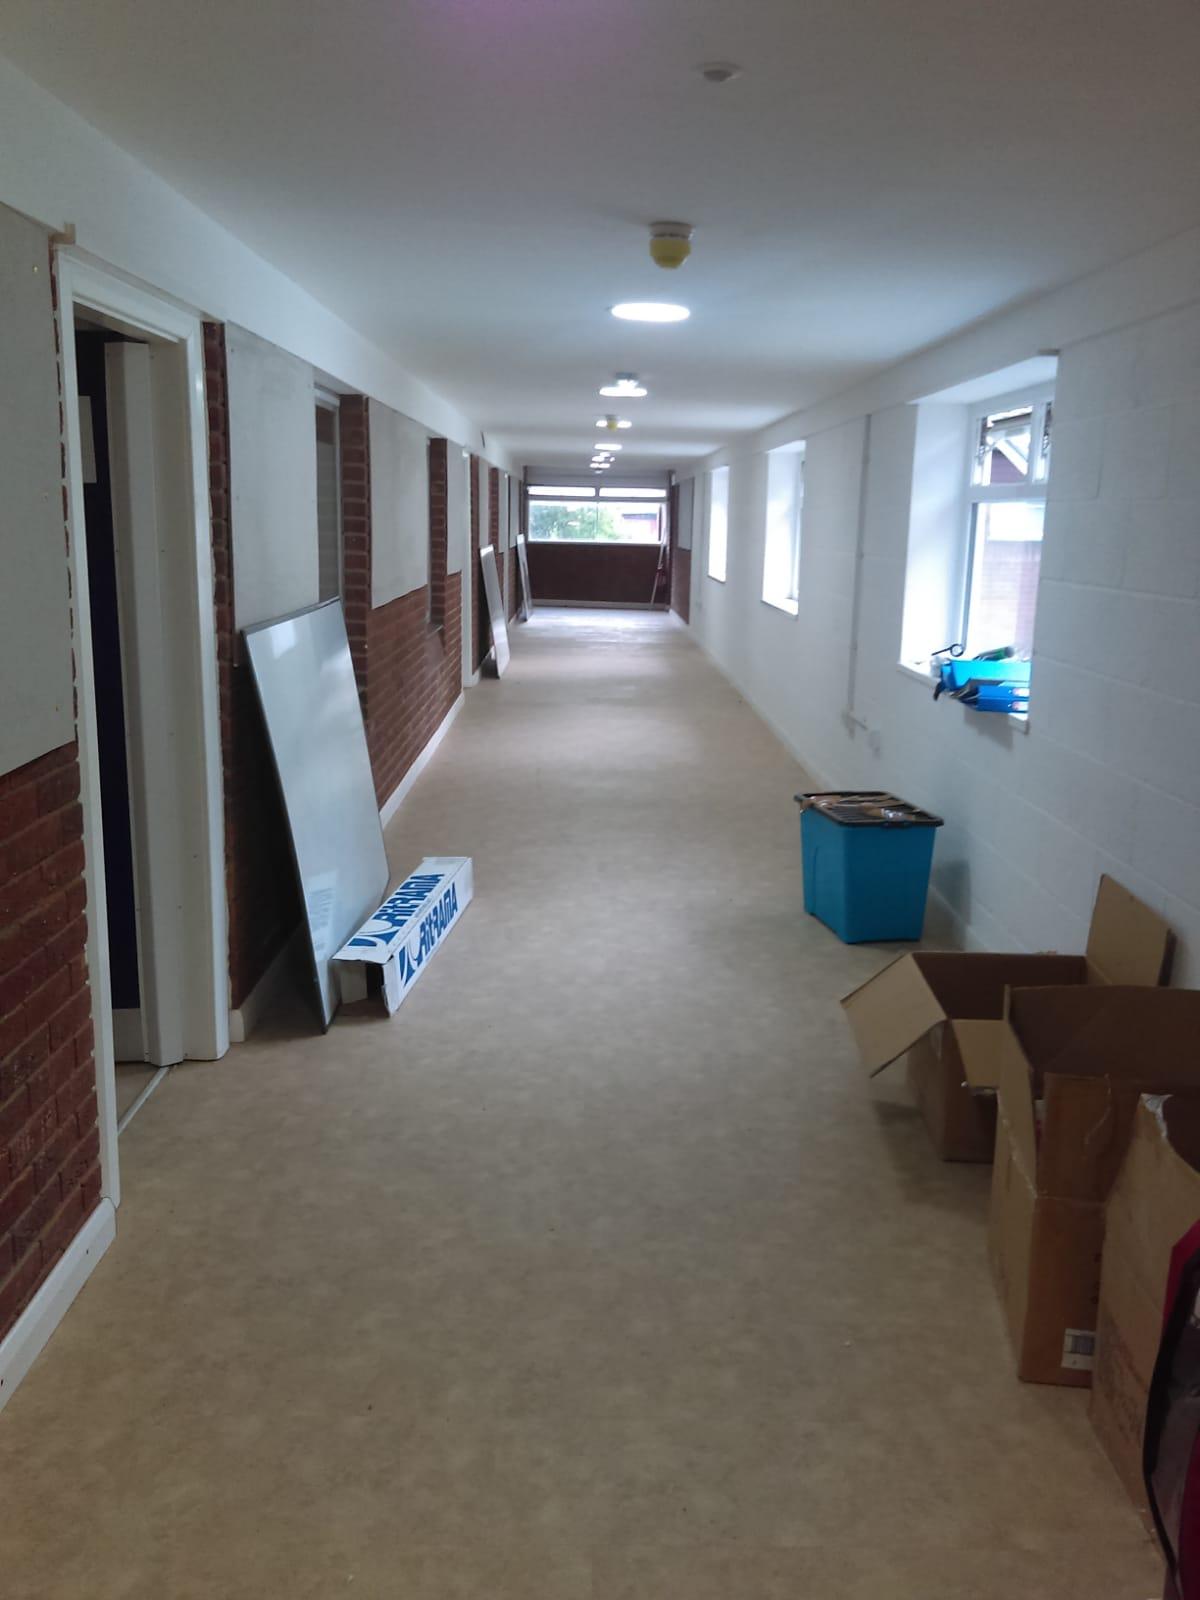 Evt Ecksteins Flooring